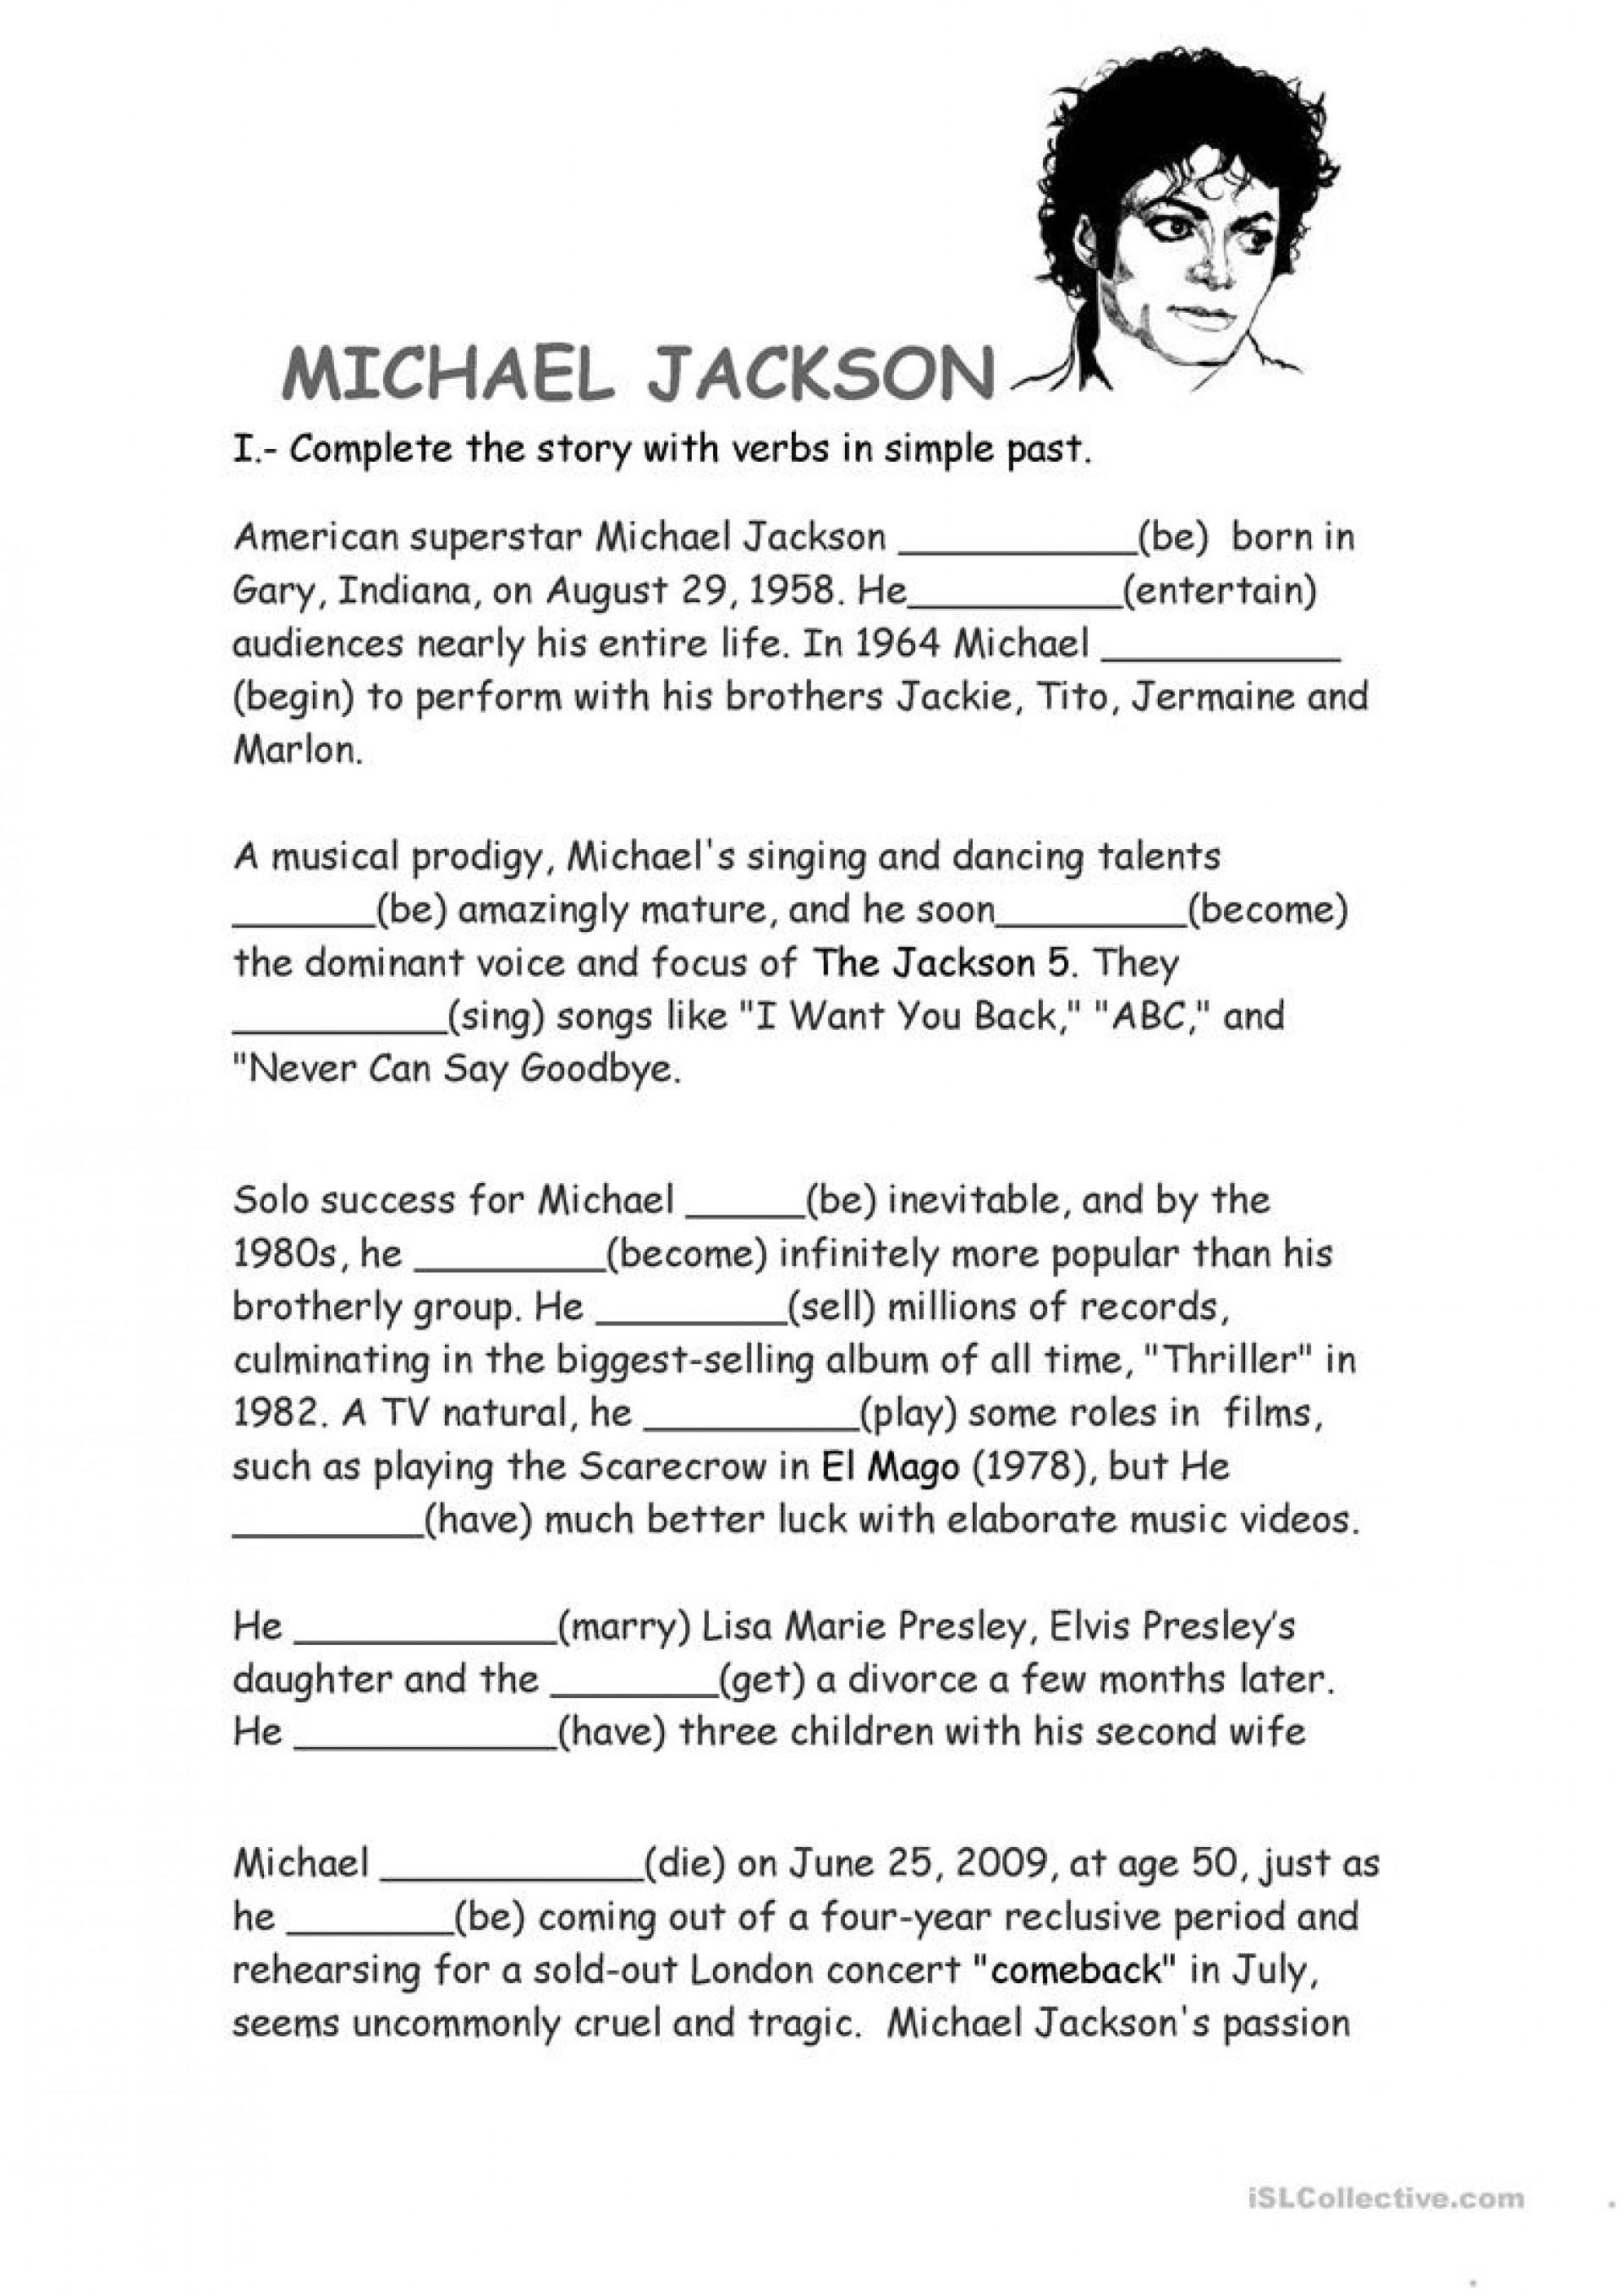 Bully Essay  High School Vs College Essay also Age Discrimination Essay  Michaelbjacksonbinspirationalbquotes Jpg Essay  Montaigne Essays Summary